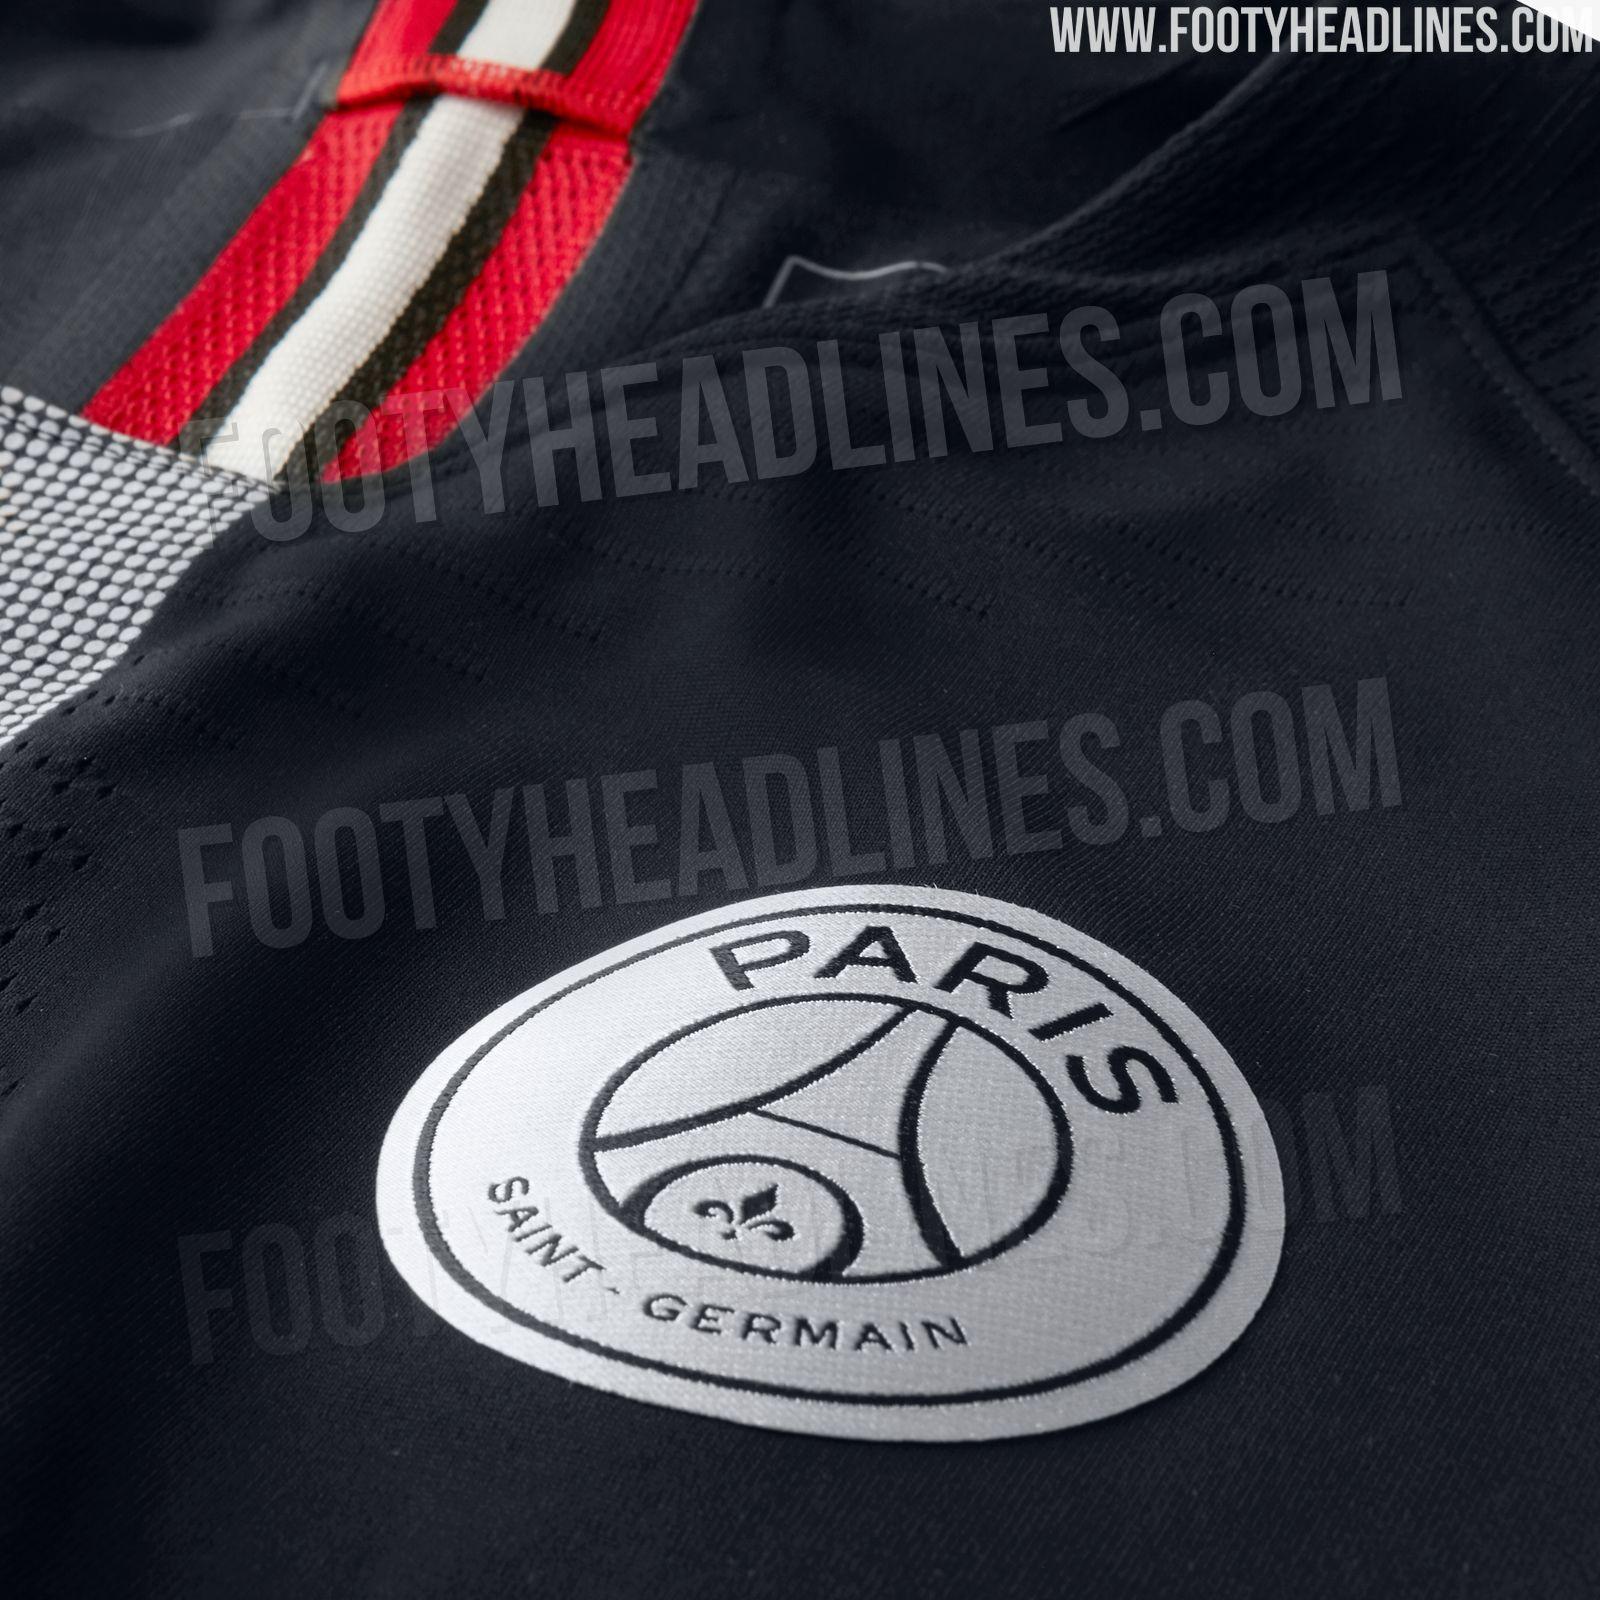 c48b1993aeba94 Jordan PSG 18 19 Champions League Kits Leaked Official